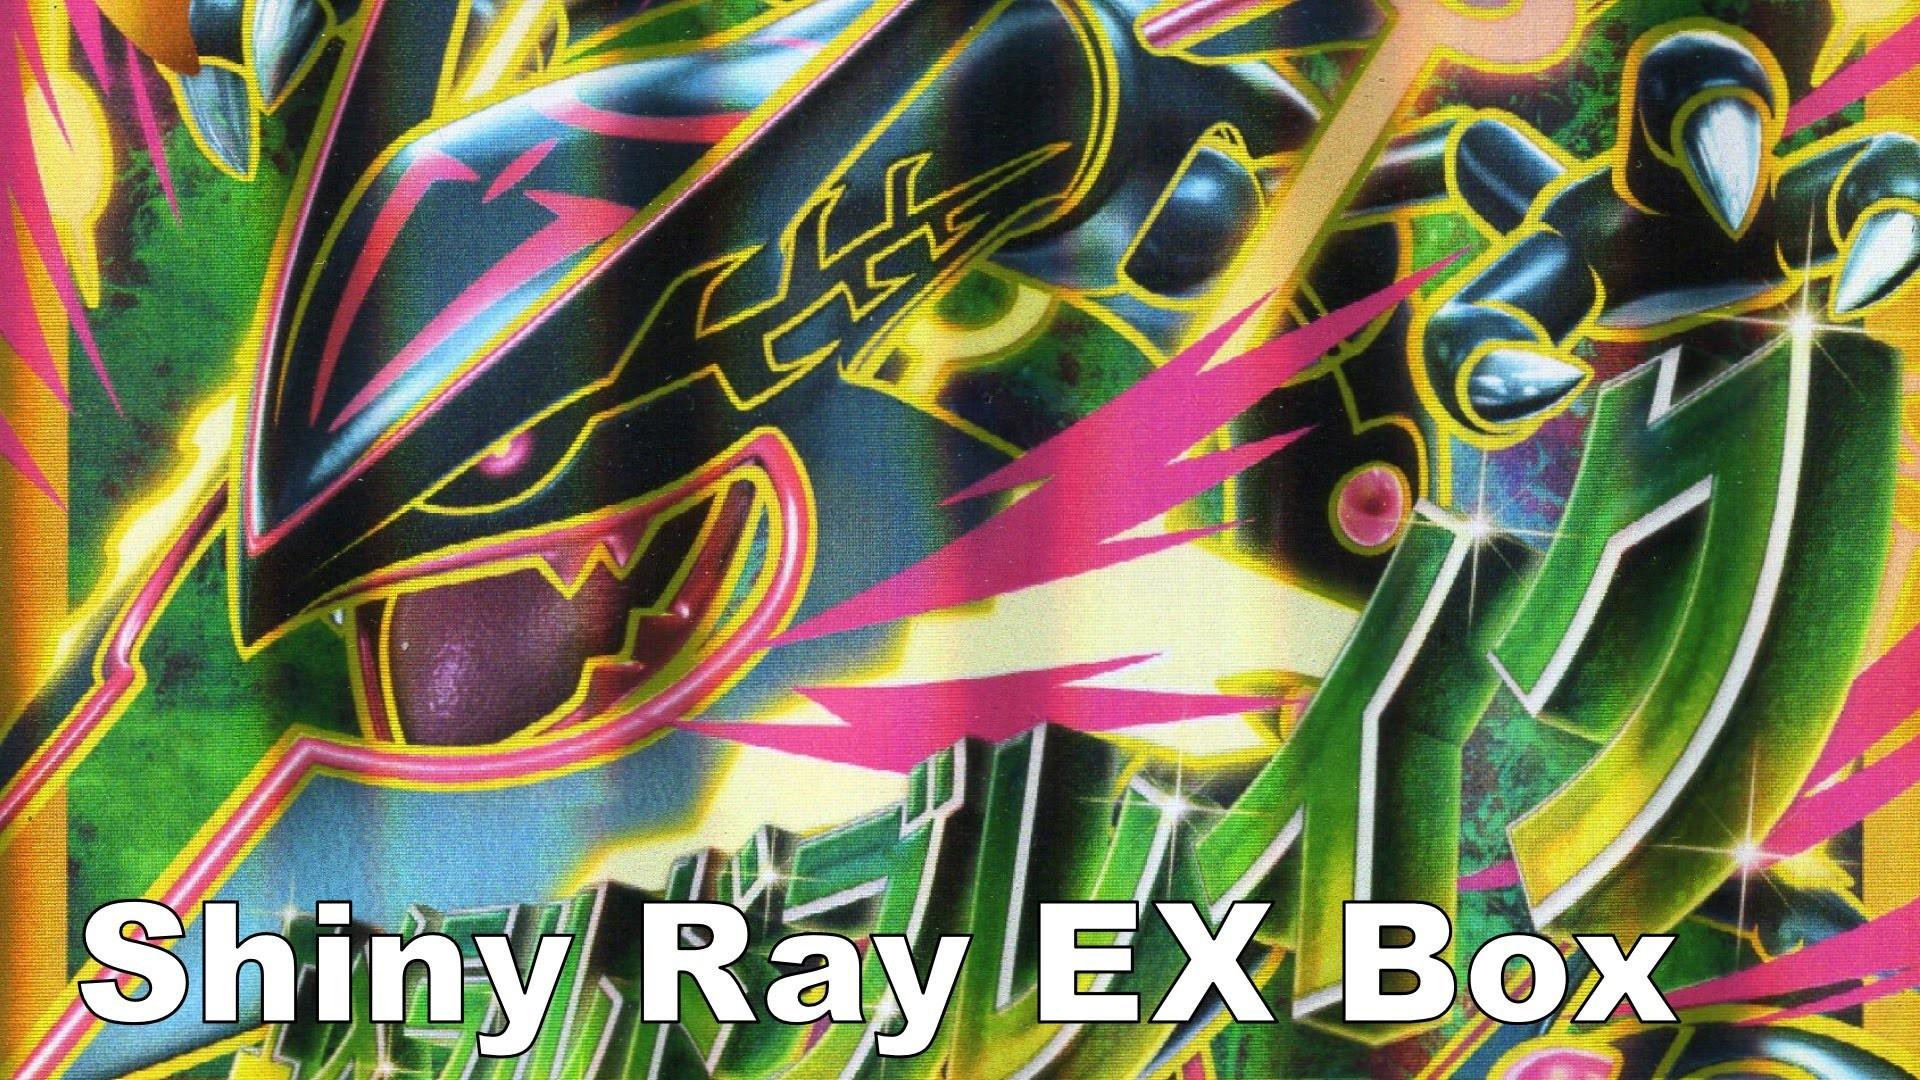 Shiny Rayquaza Wallpaper (70+ images)